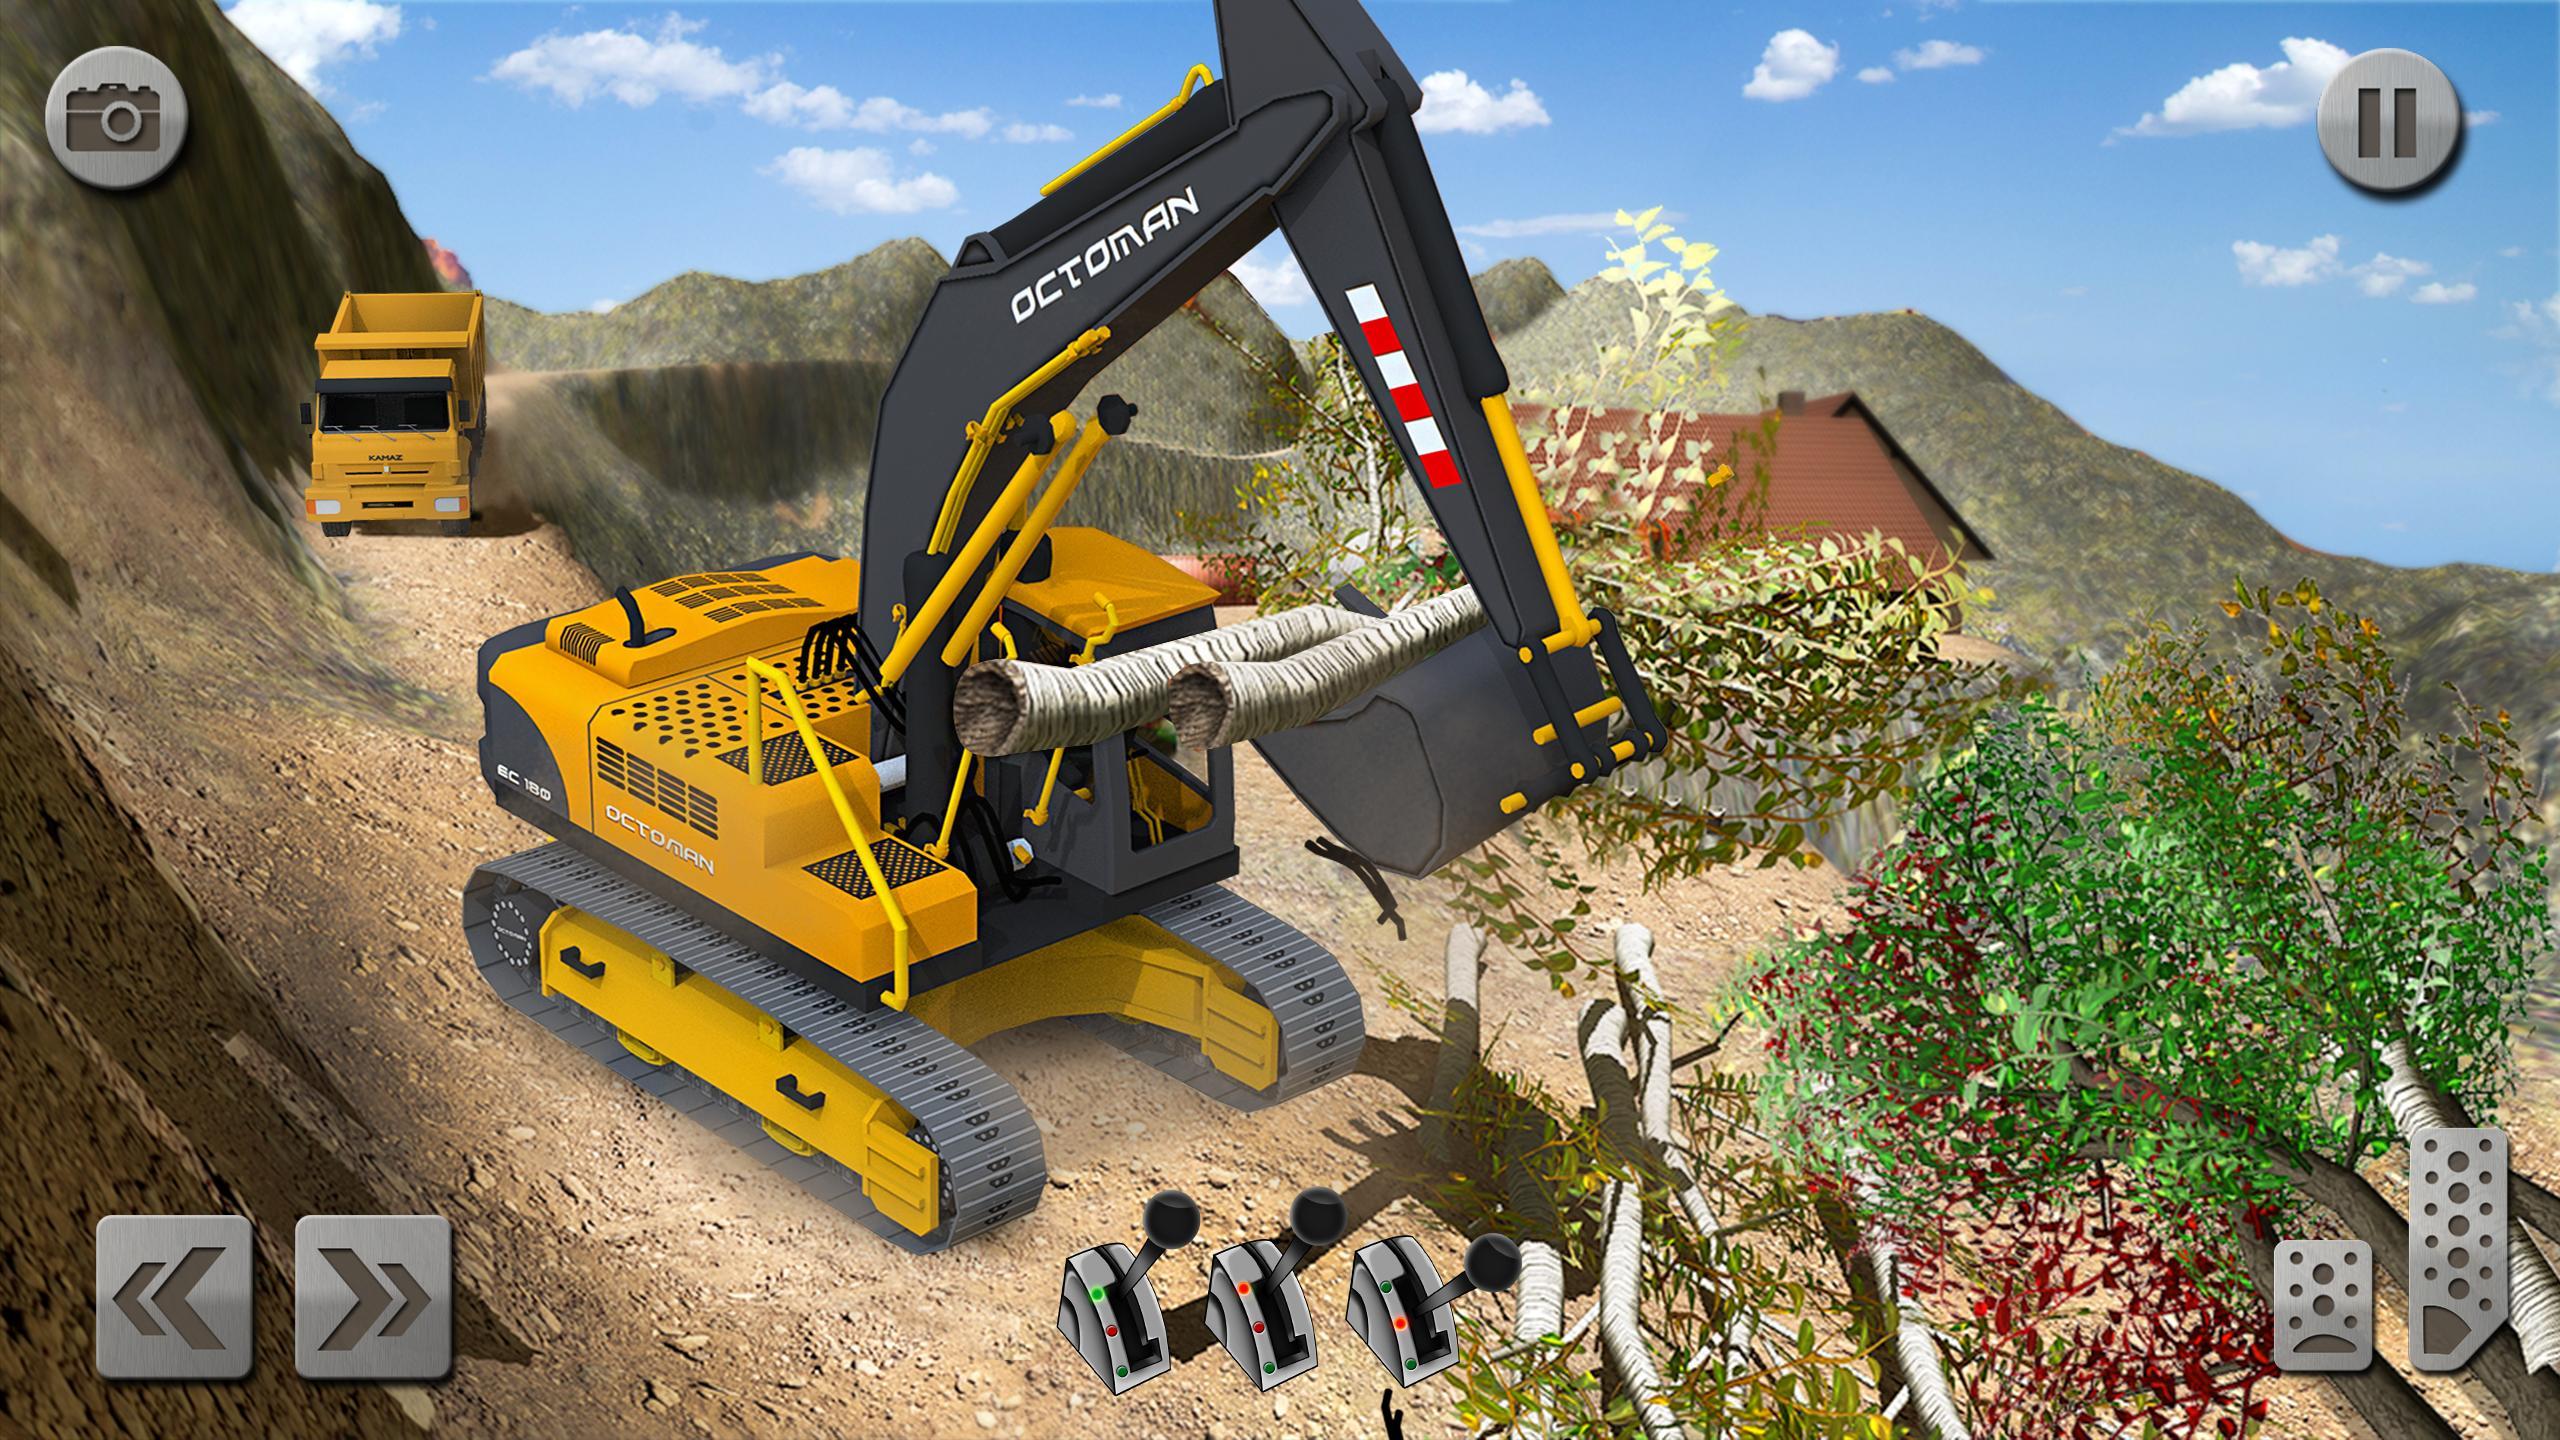 Sand Excavator Truck Driving Rescue Simulator game 5.2 Screenshot 6